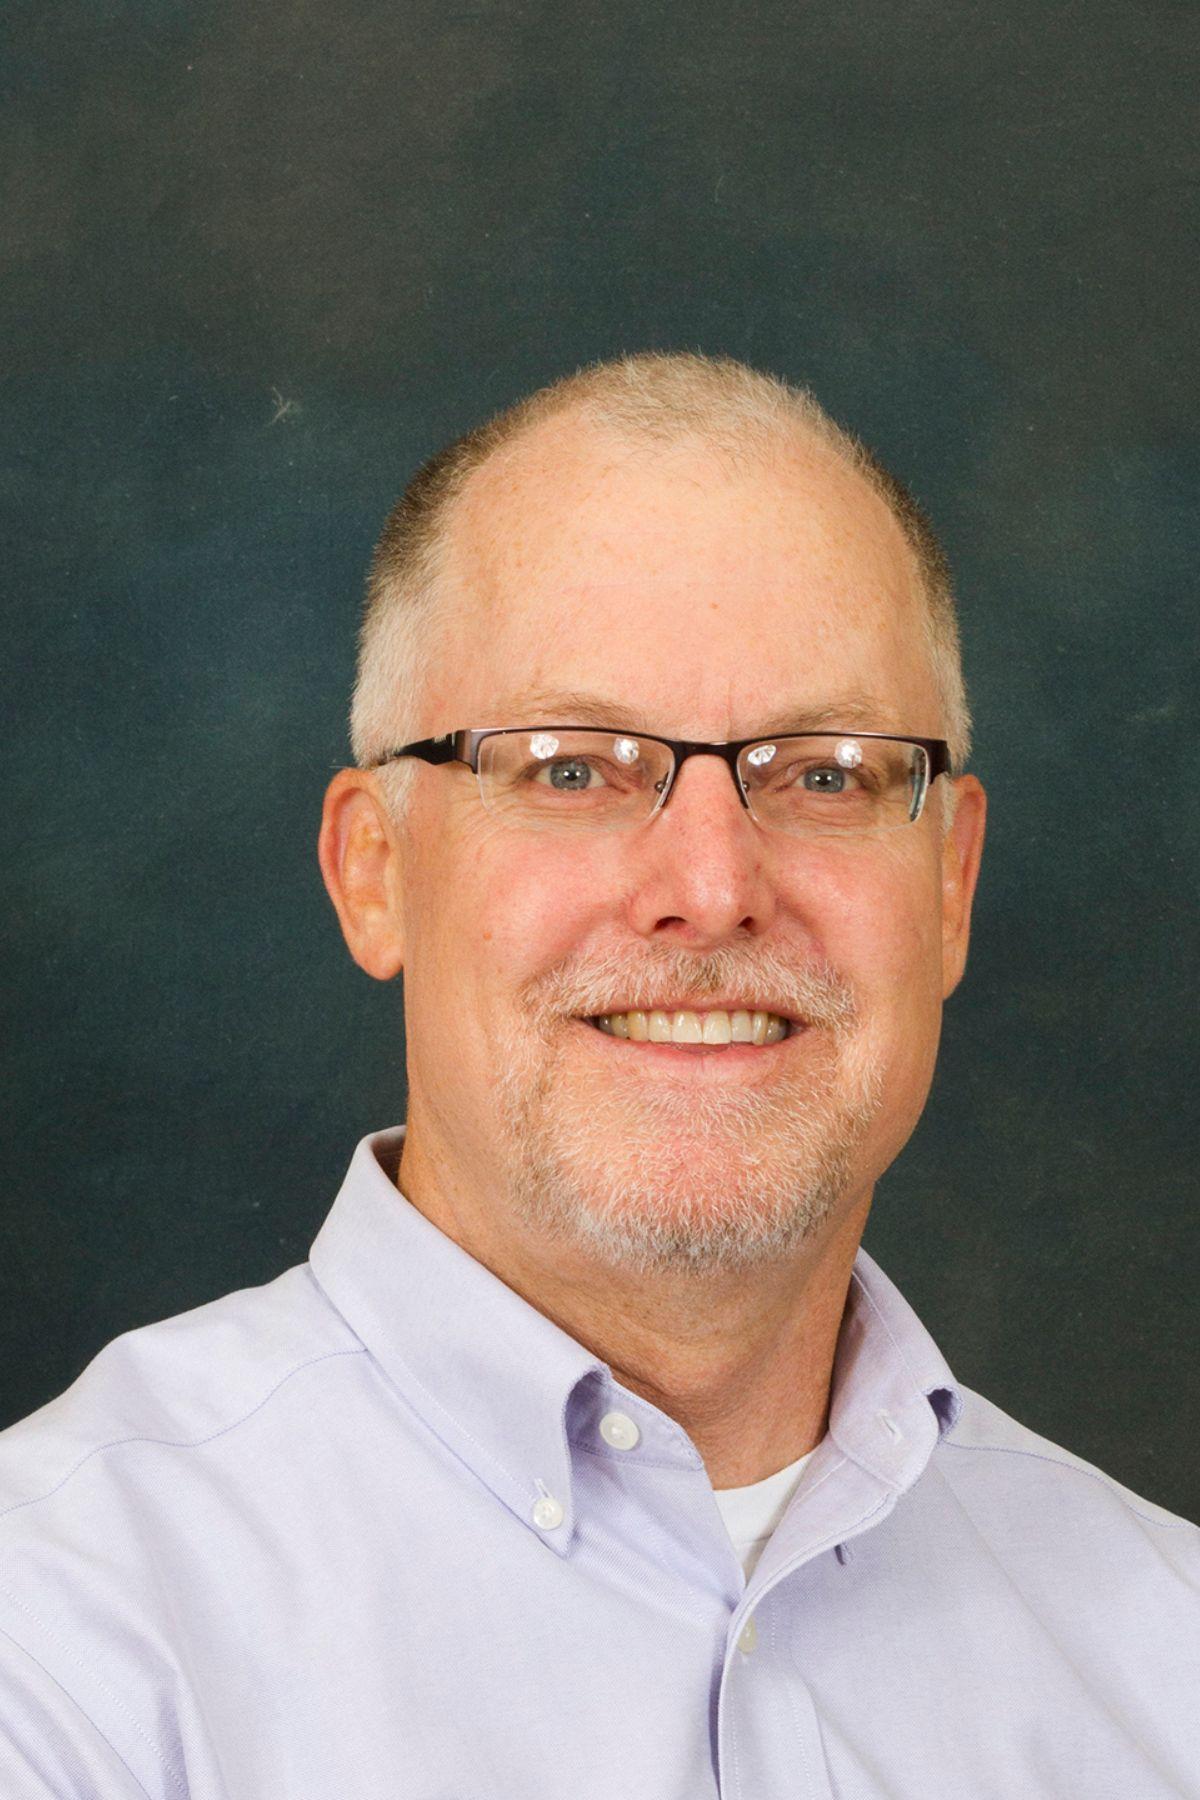 Dr. Brian Eberhard